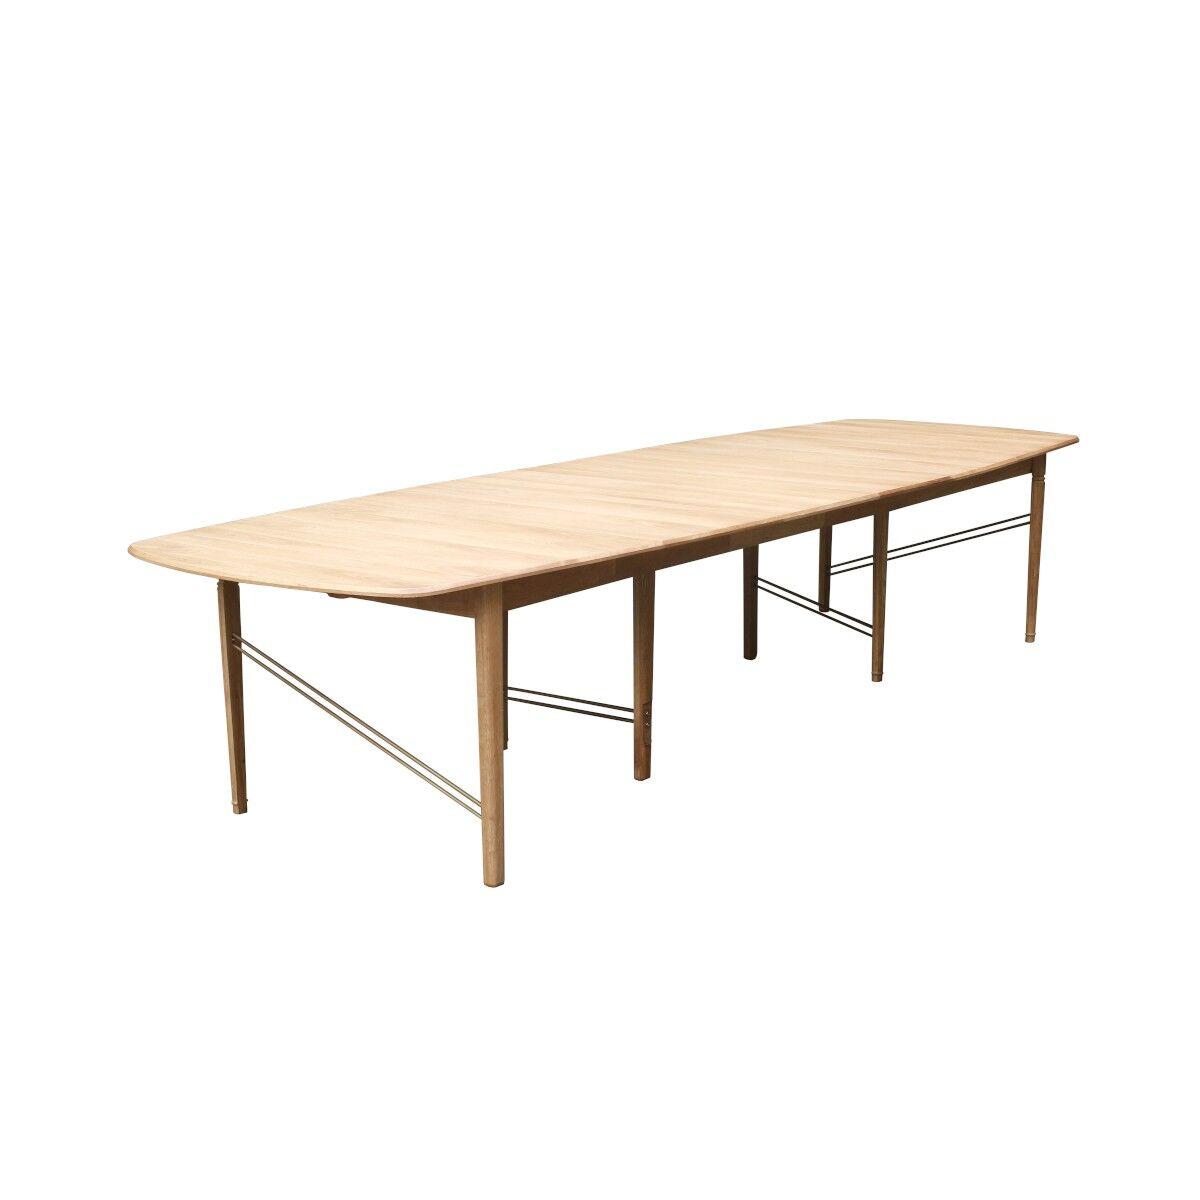 Robin des Bois Grande table chne clair naturel